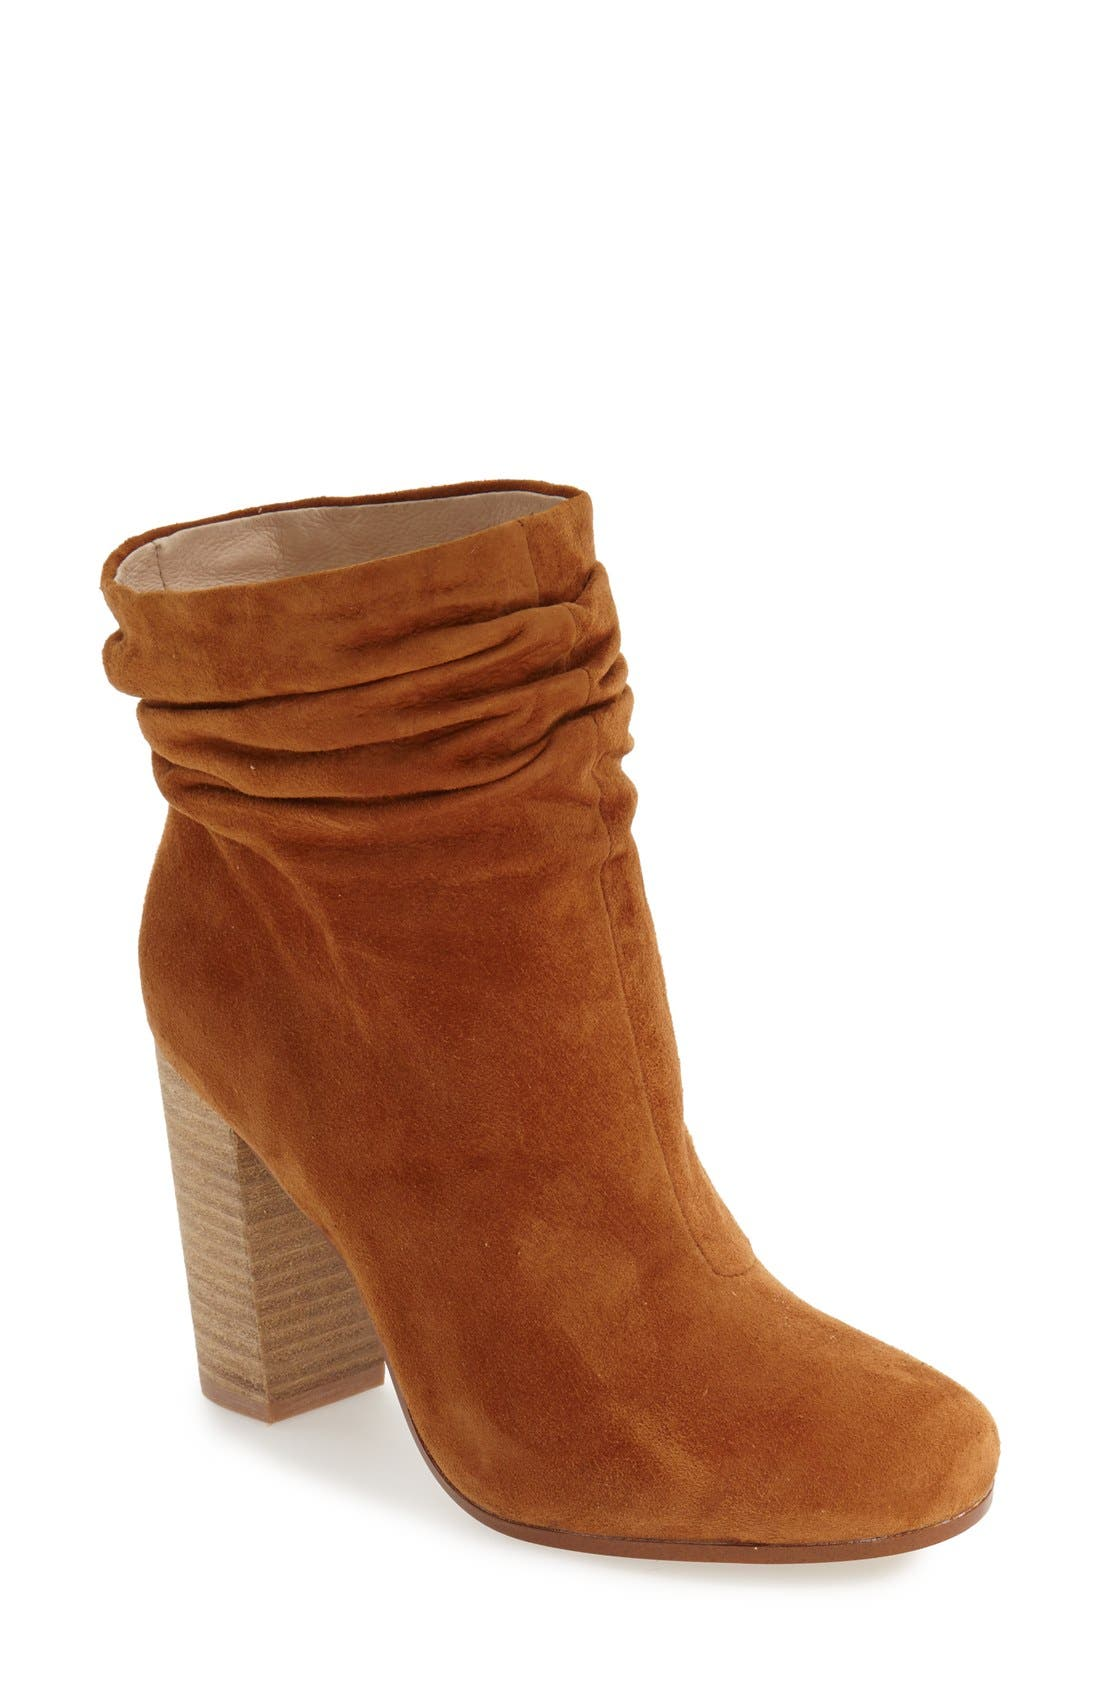 Georgie Block Heel Boot,                         Main,                         color, Caramel Suede